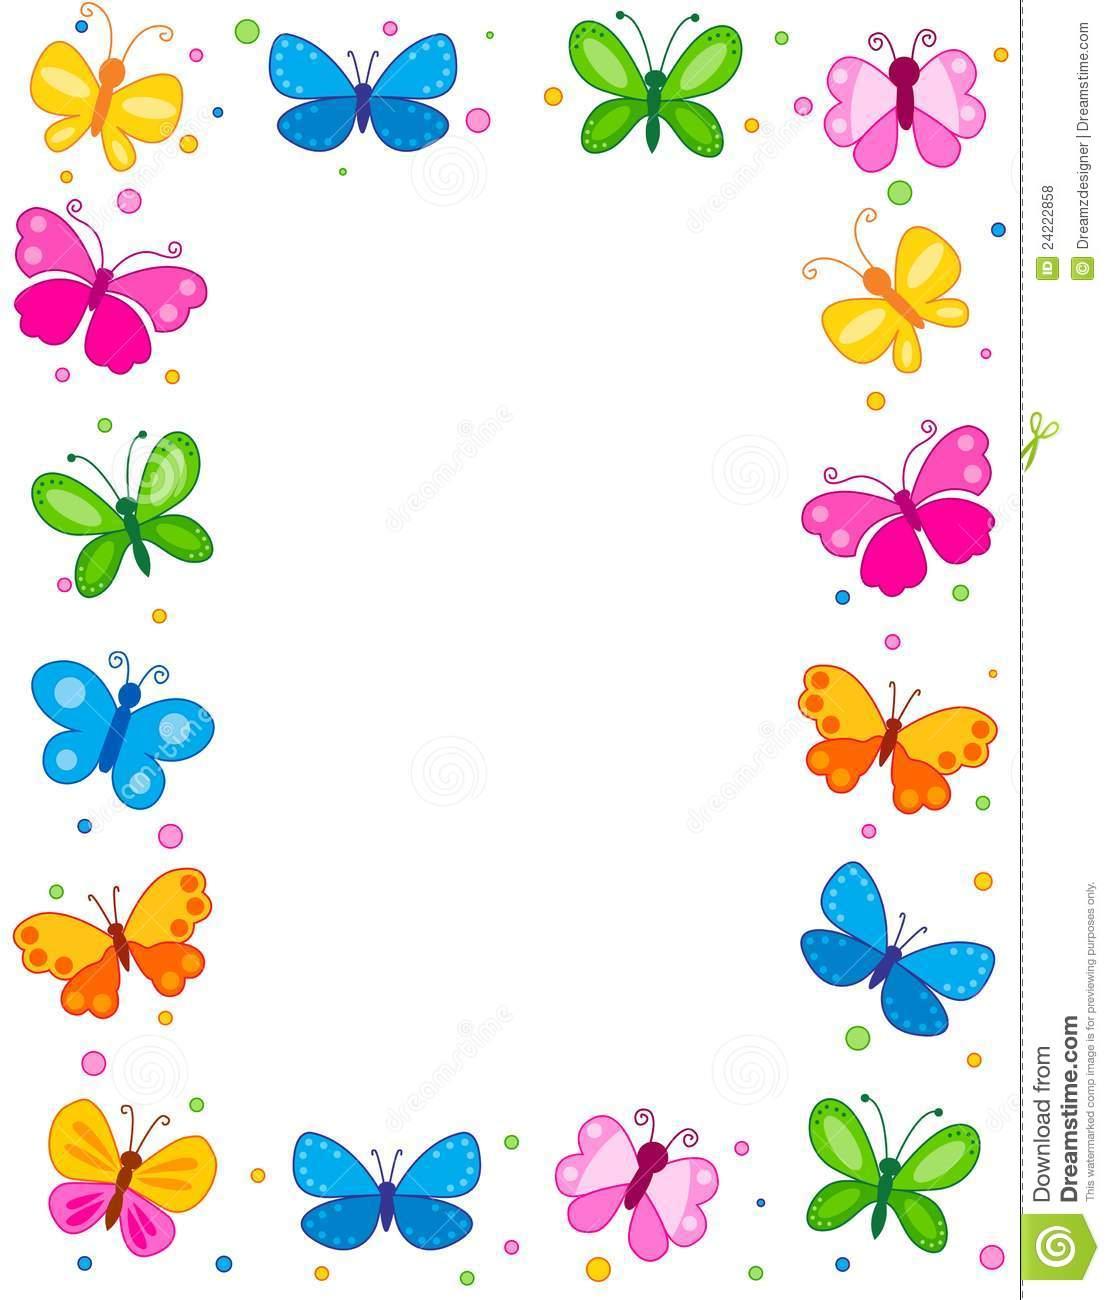 Free Butterfly Borders-free butterfly borders-11